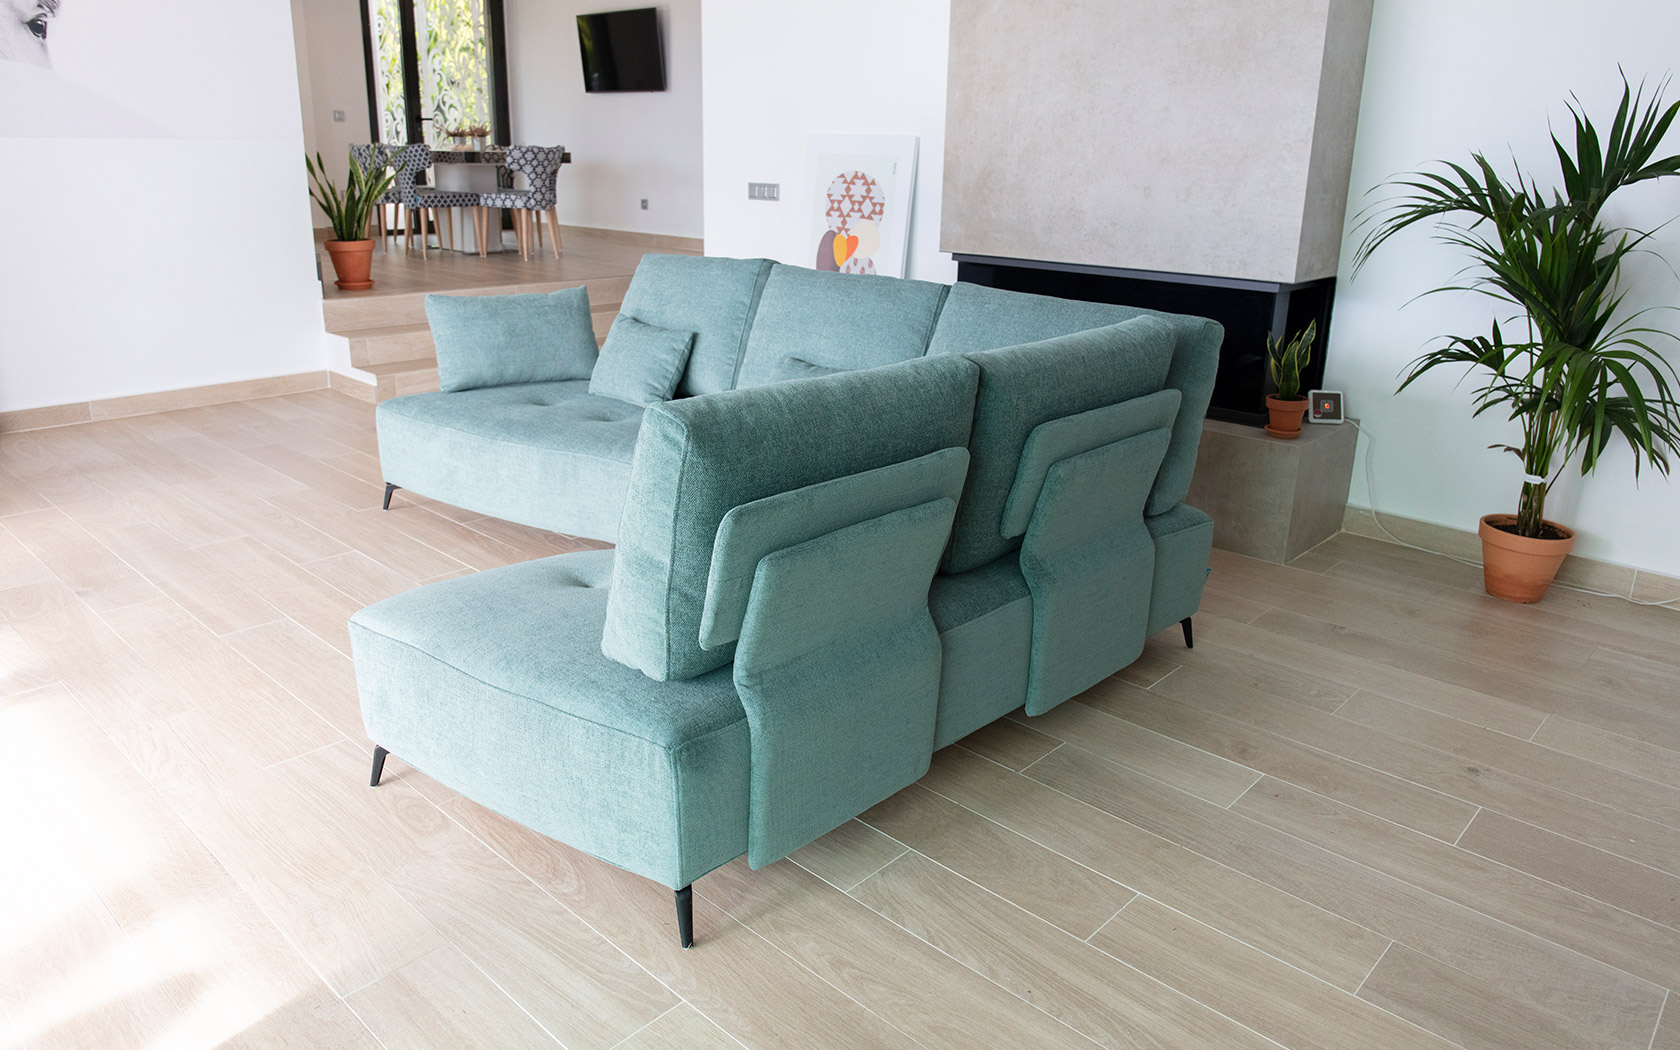 kalahari sofa 2021 17